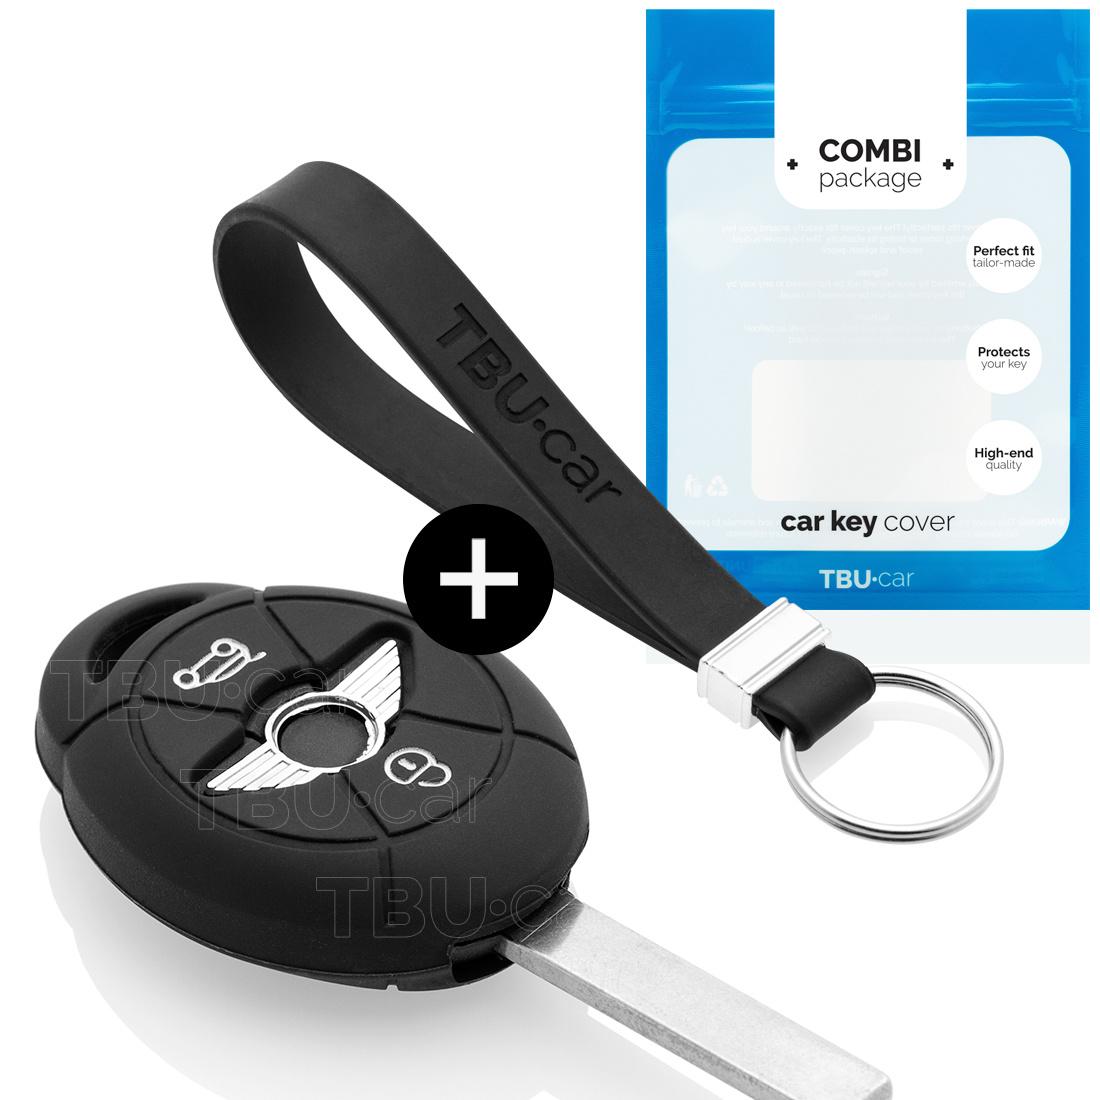 TBU car TBU car Autoschlüssel Hülle kompatibel mit Mini 3 Tasten - Schutzhülle aus Silikon - Auto Schlüsselhülle Cover in Schwarz